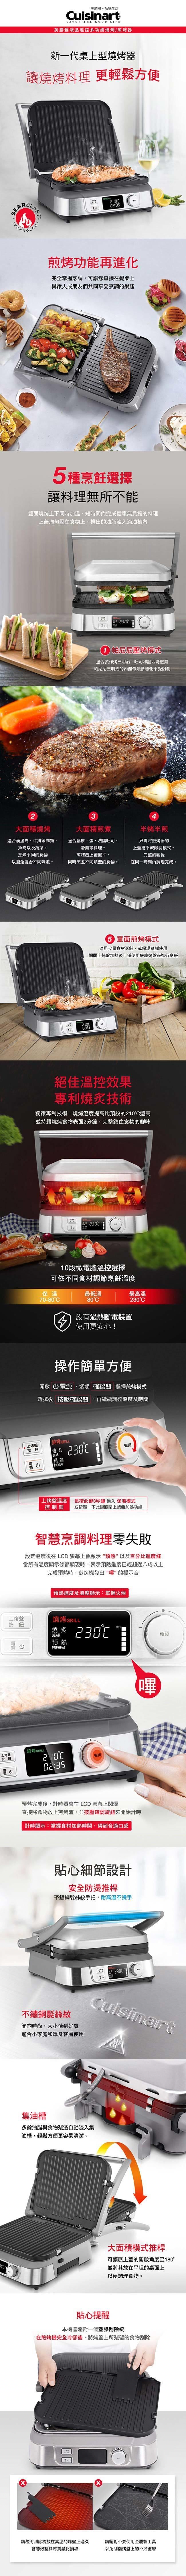 Cuisinart|液晶溫控多功能煎烤盤 GR-5NTW